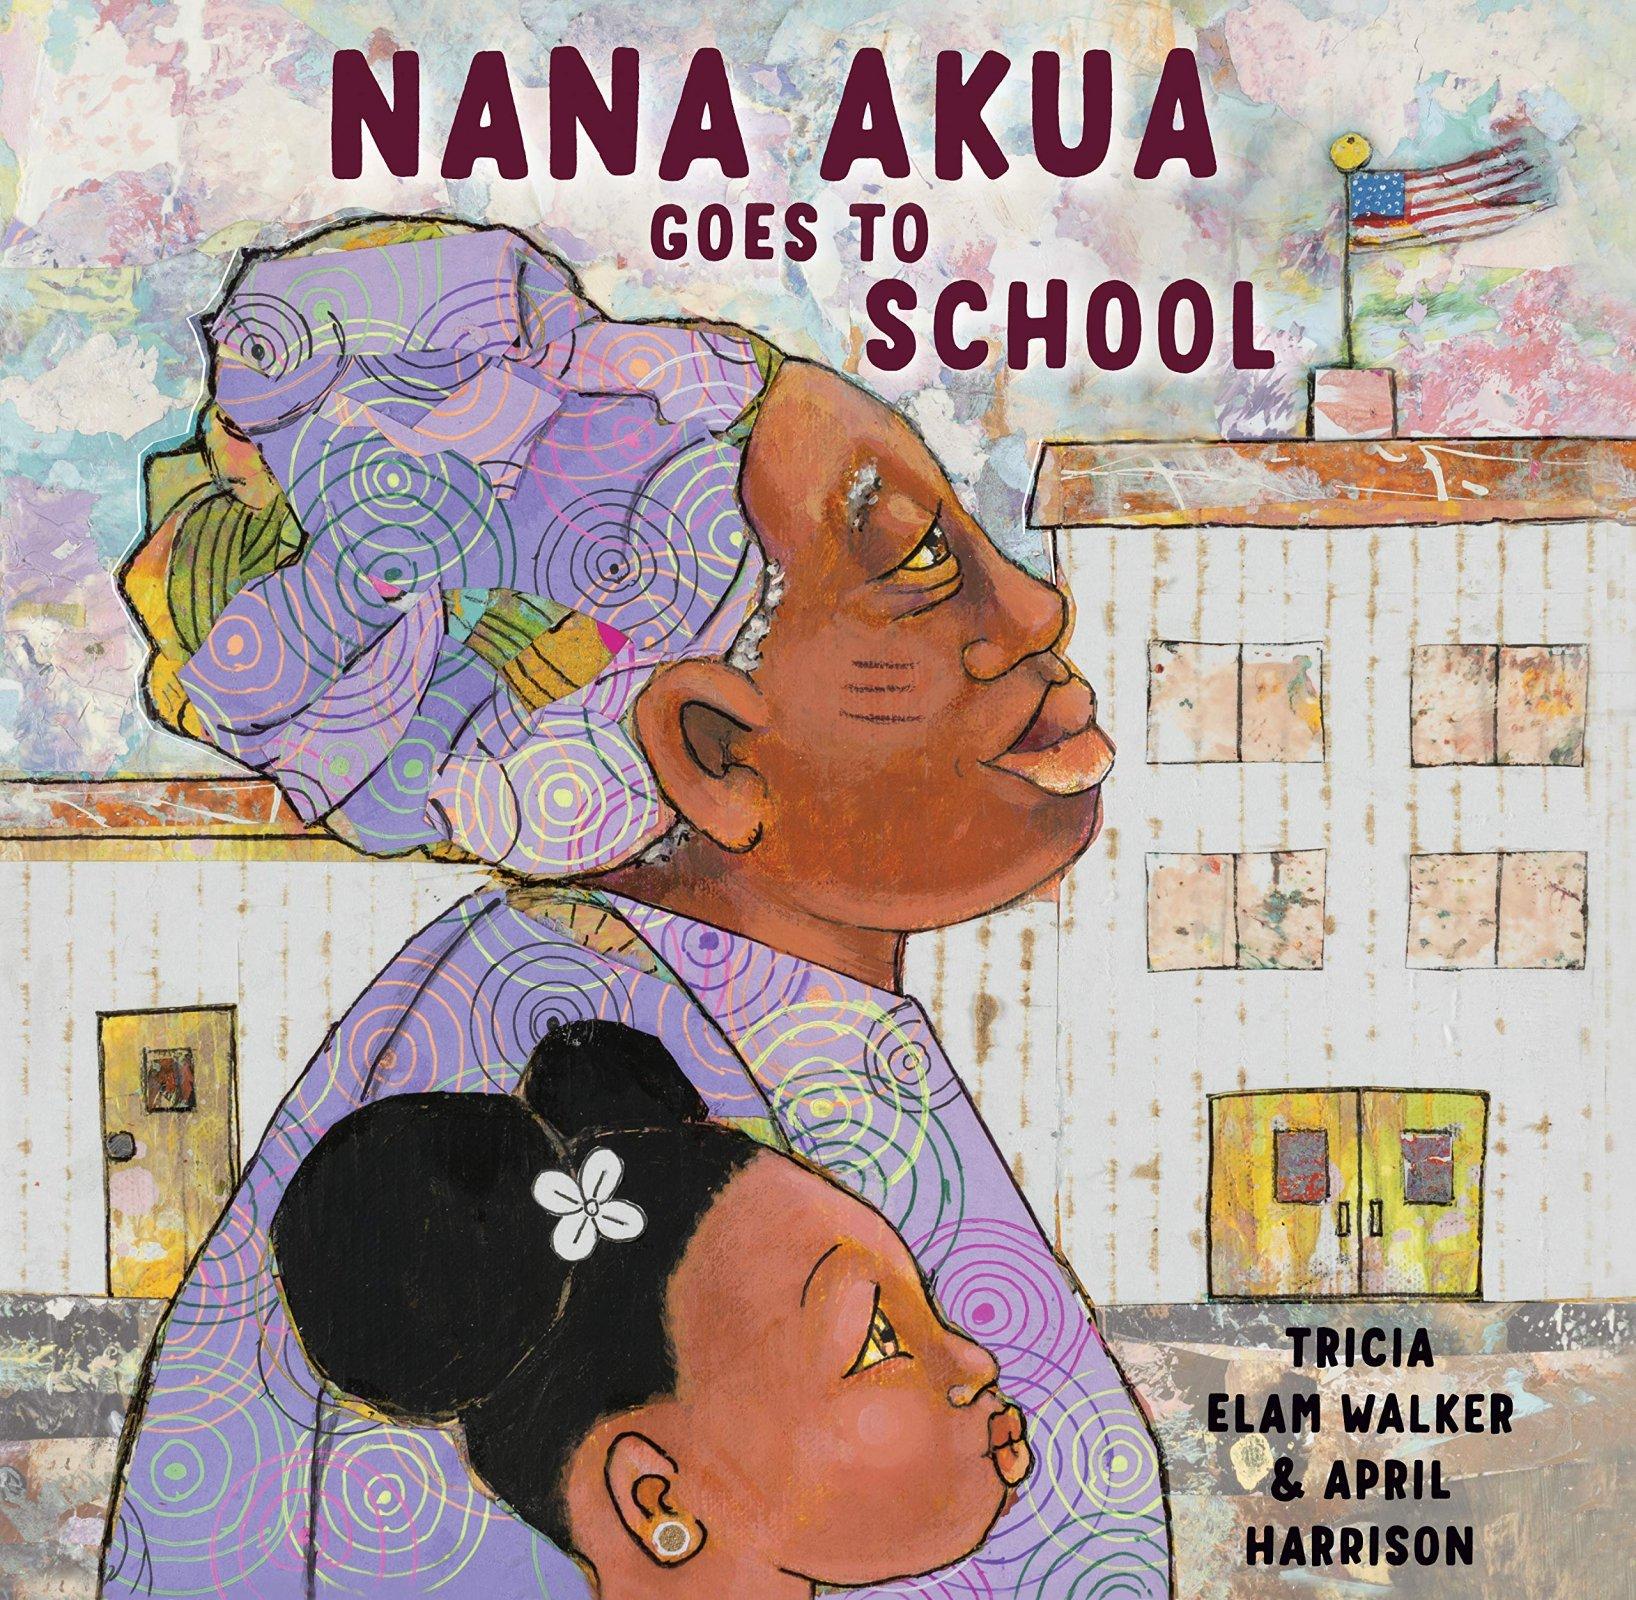 Nana Akua Goes To School by Tricia Elam Walker & April Harrison